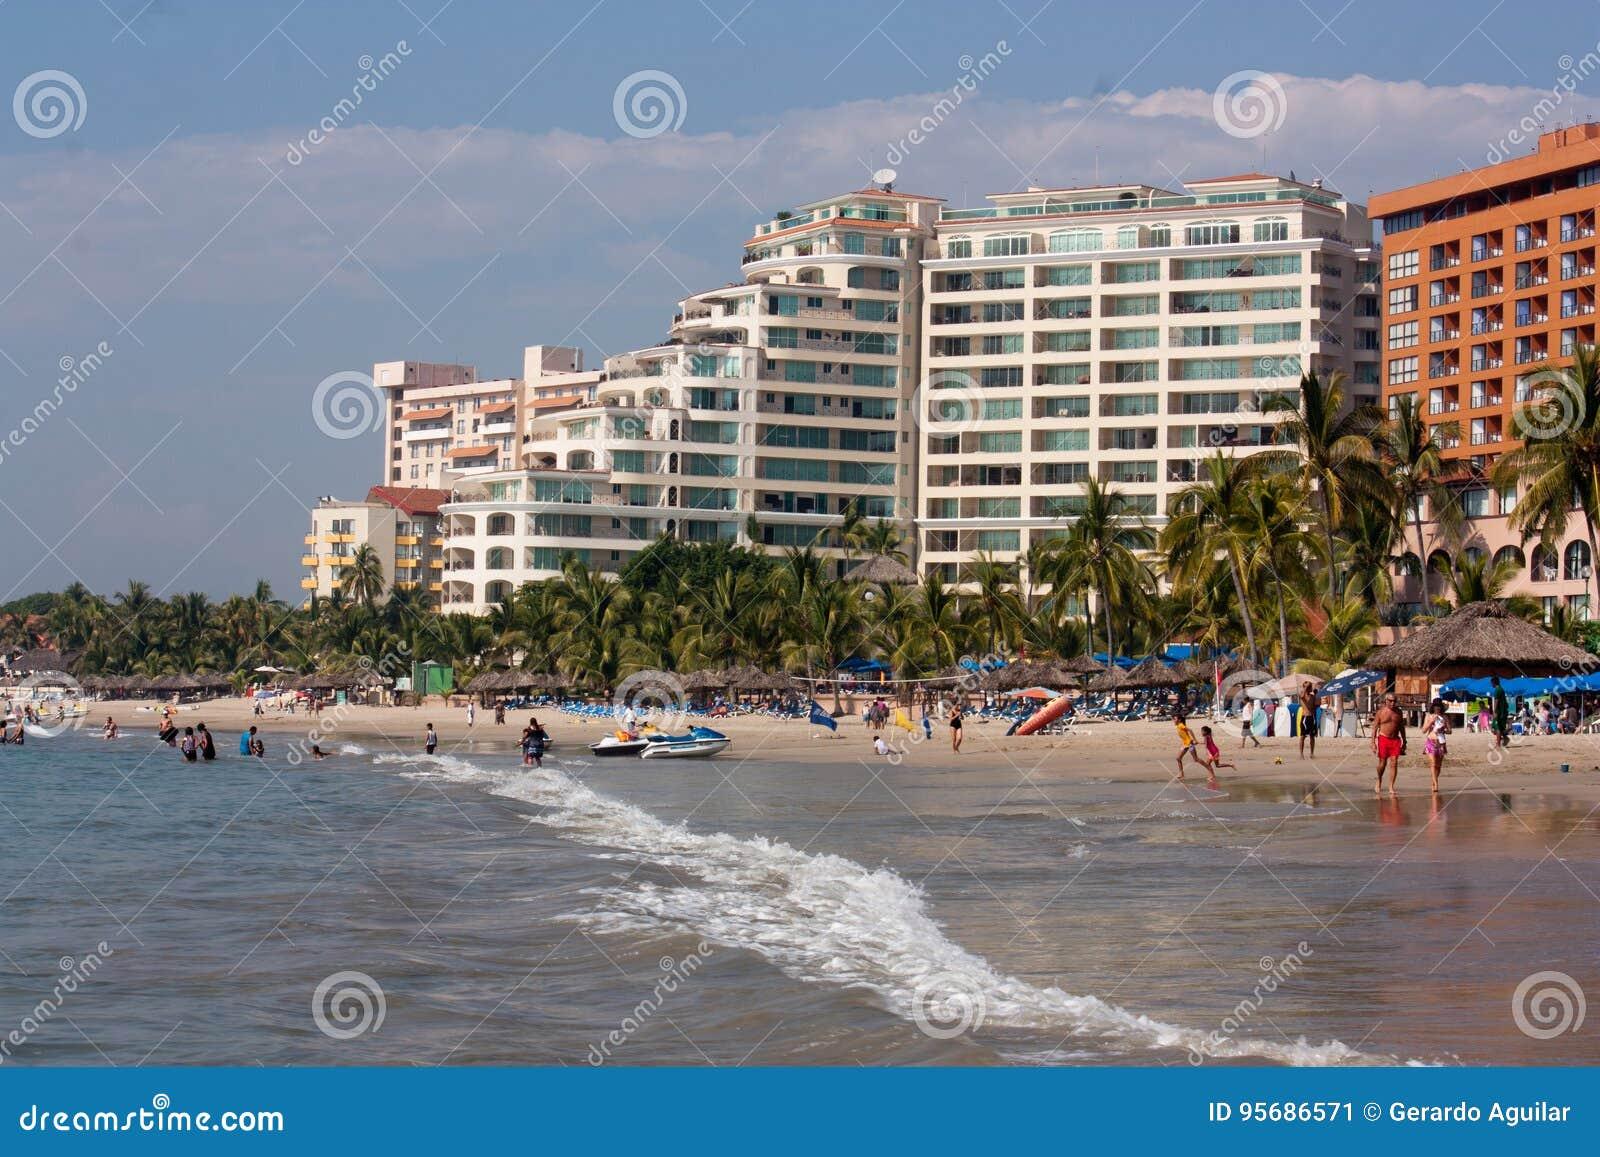 Beach and hotels in Ixtapa bay